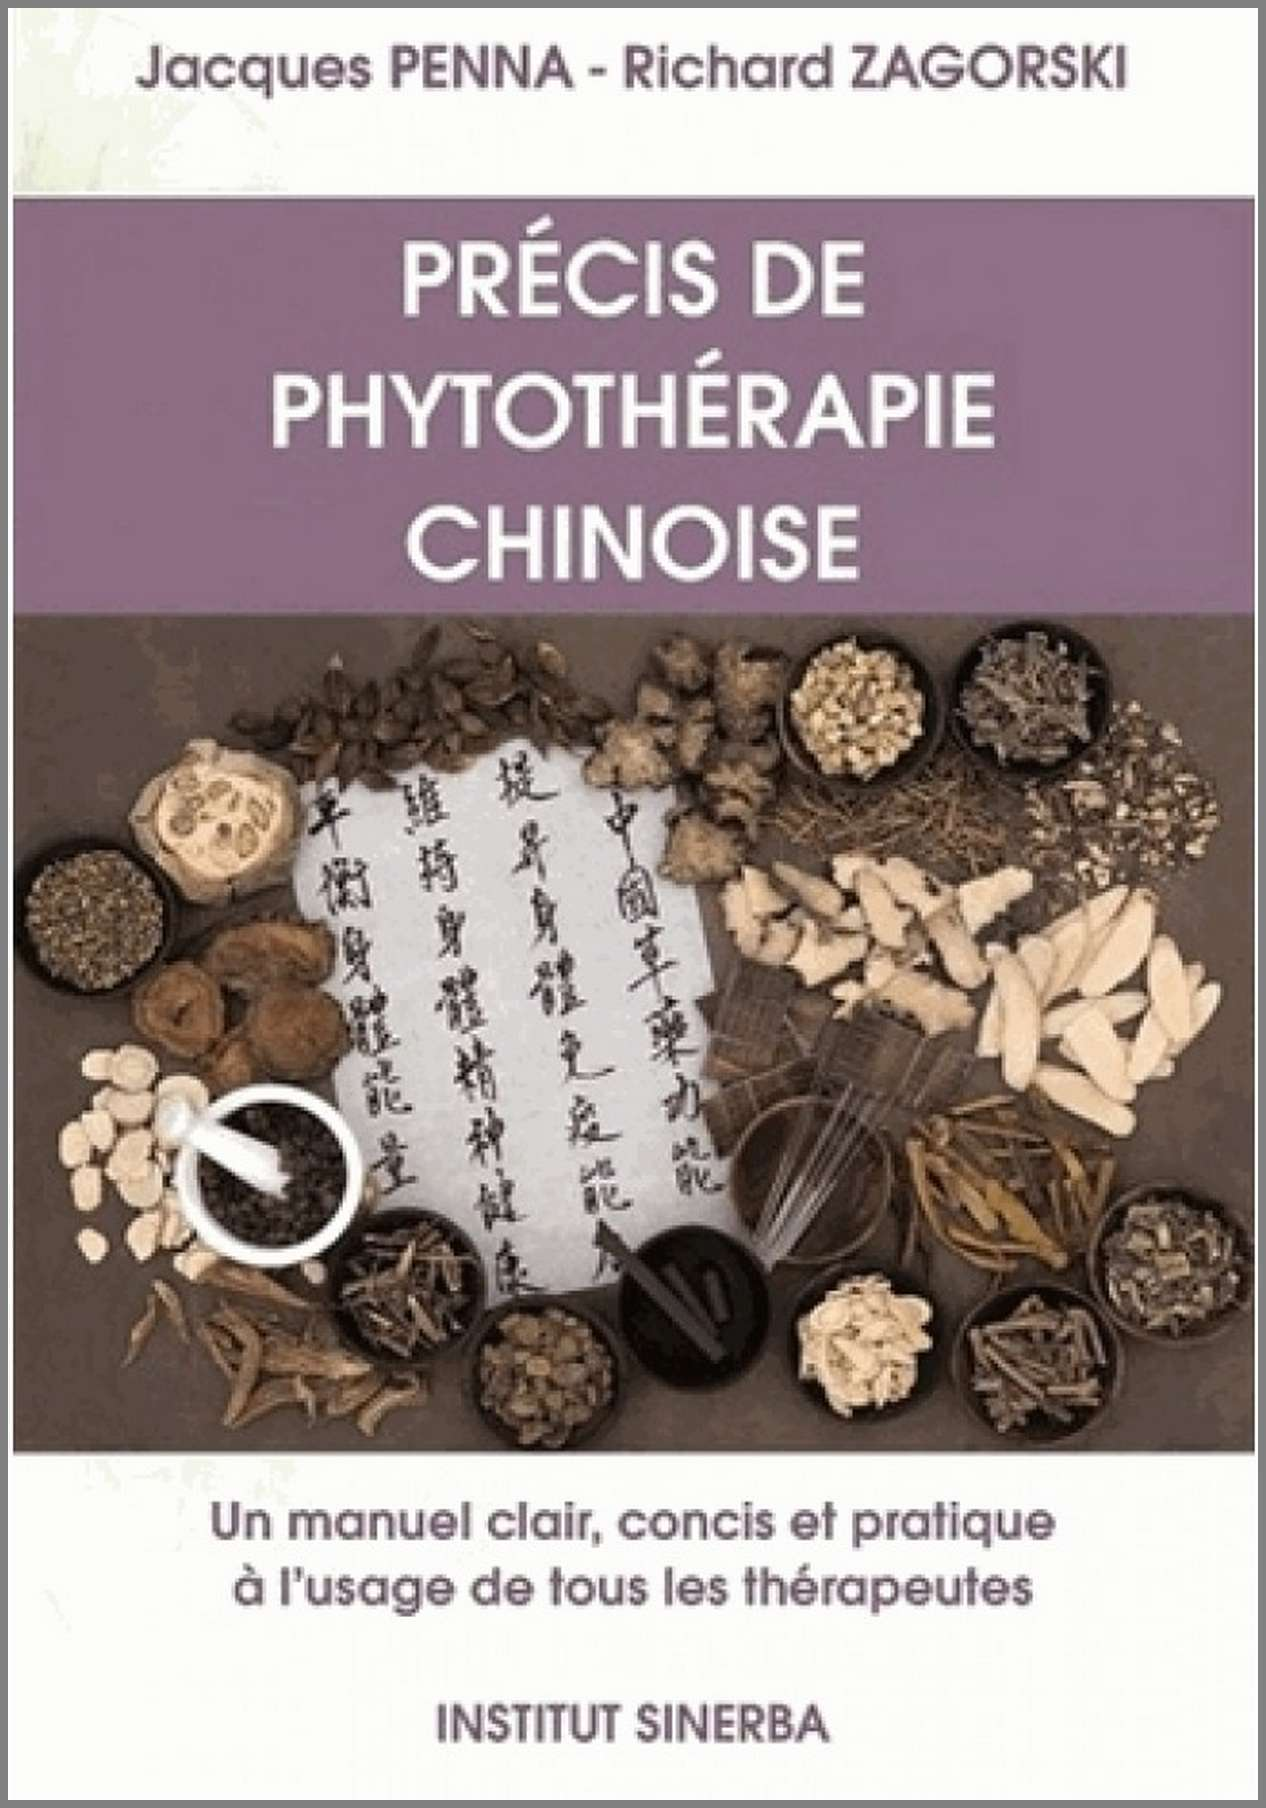 PRECIS DE PHYTOTHERAPIE CHINOISE